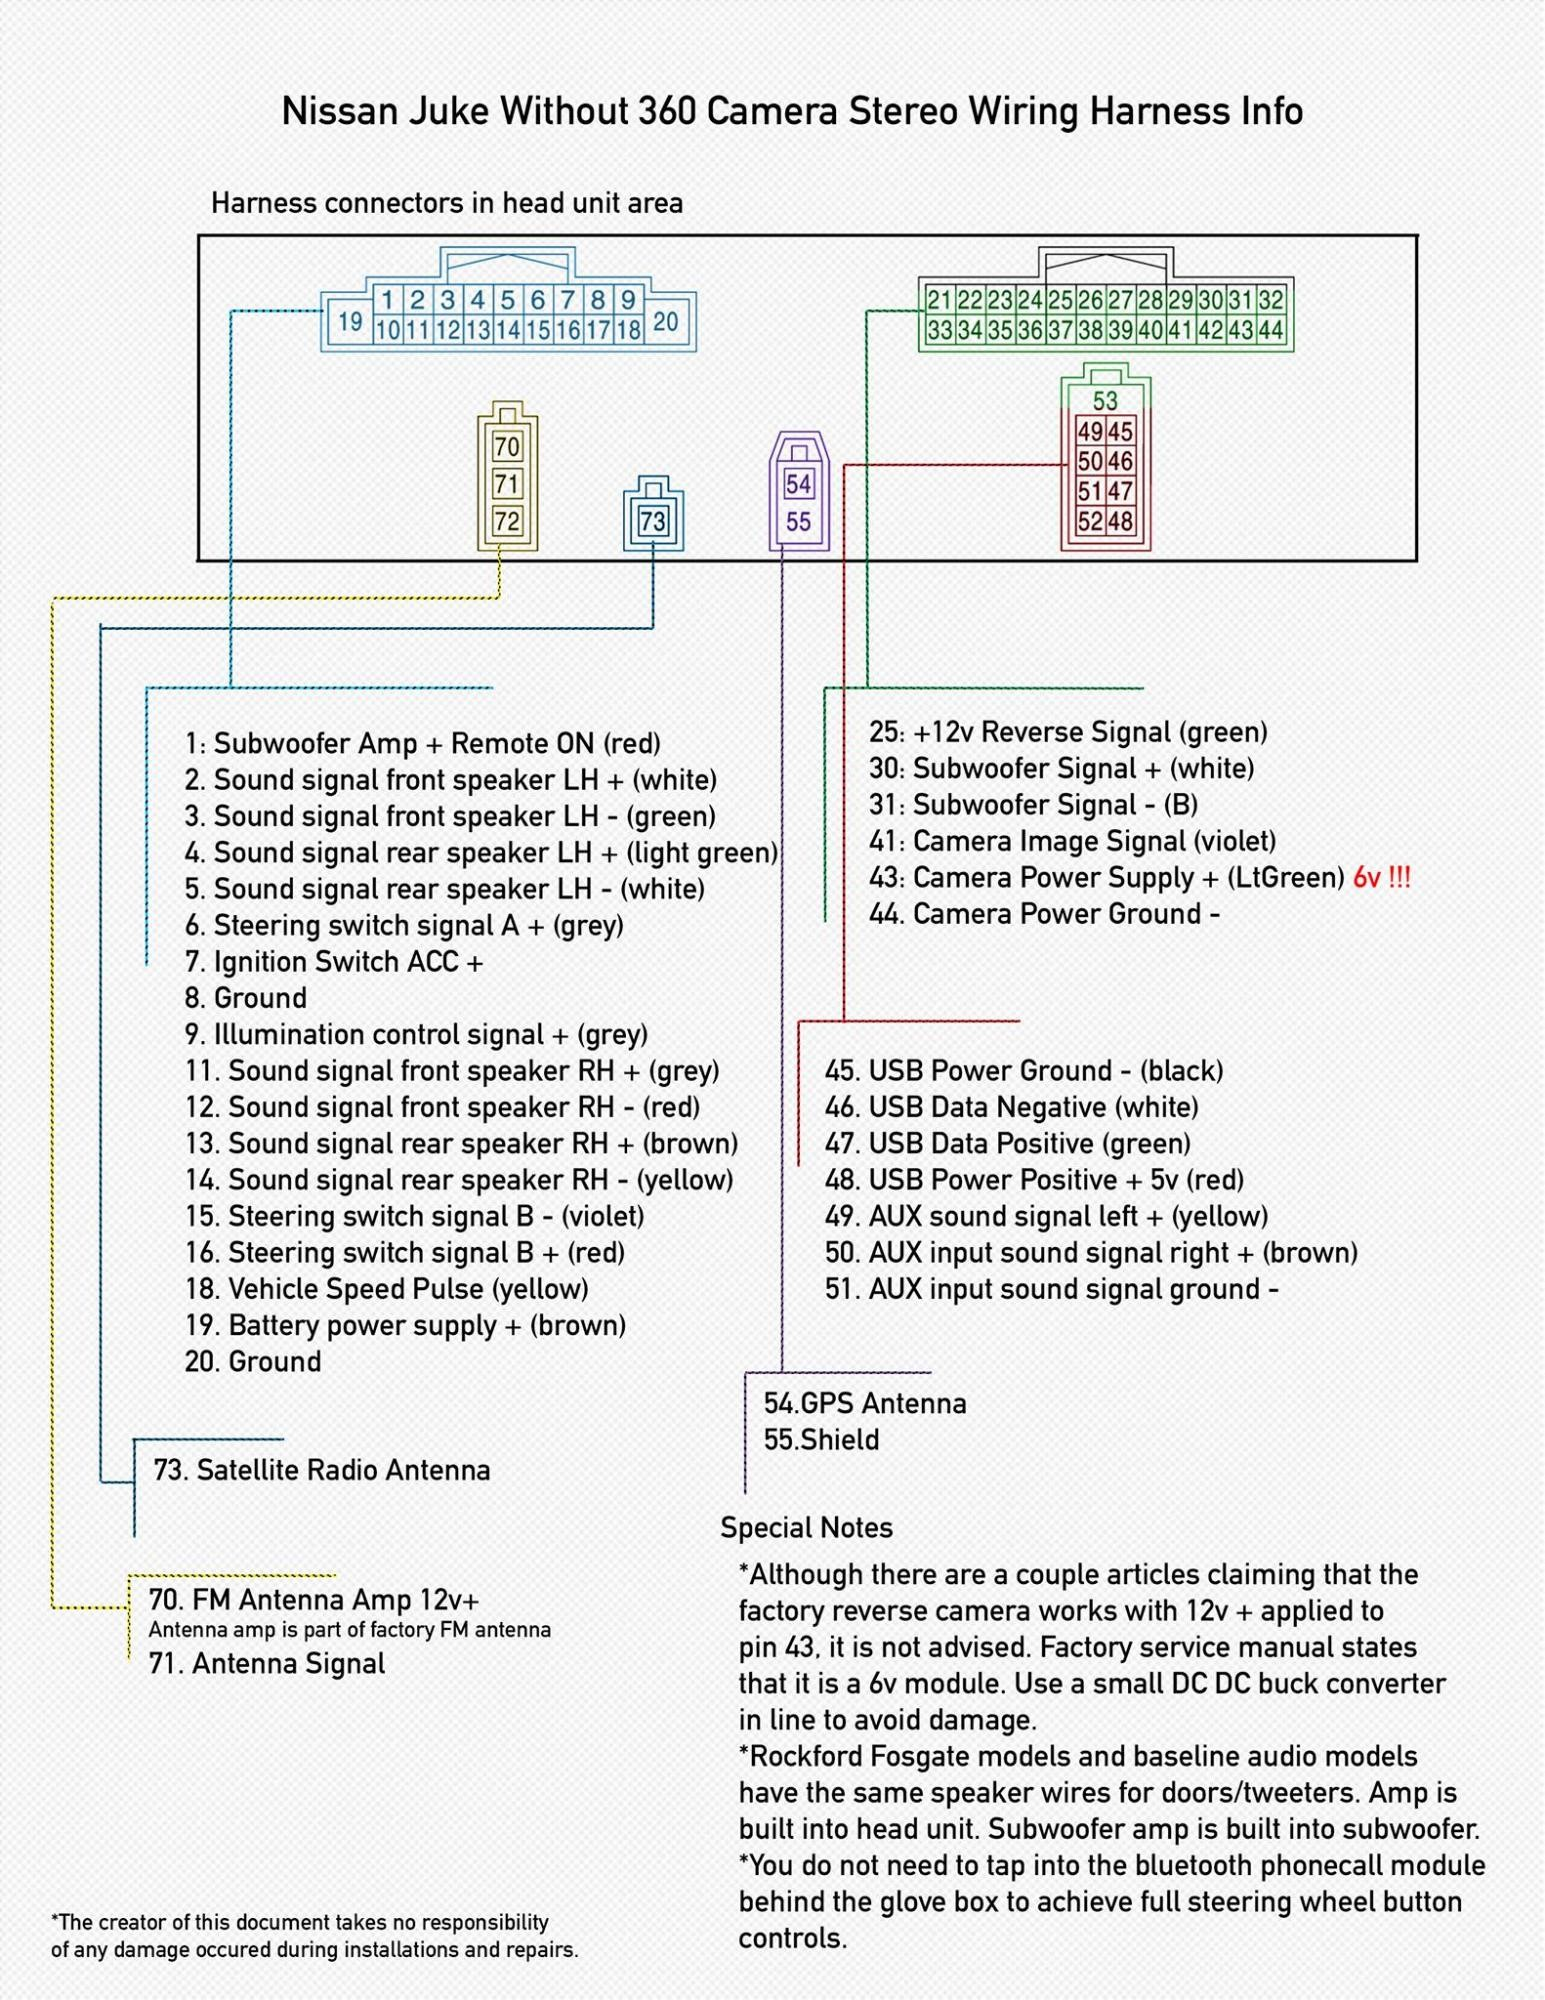 Nissan Almera 2003 Radio Diagram B8185-8m00 Nissan Color Codes Wiring Diagram P H Crane Controller Of Nissan Almera 2003 Radio Diagram B8185-8m00